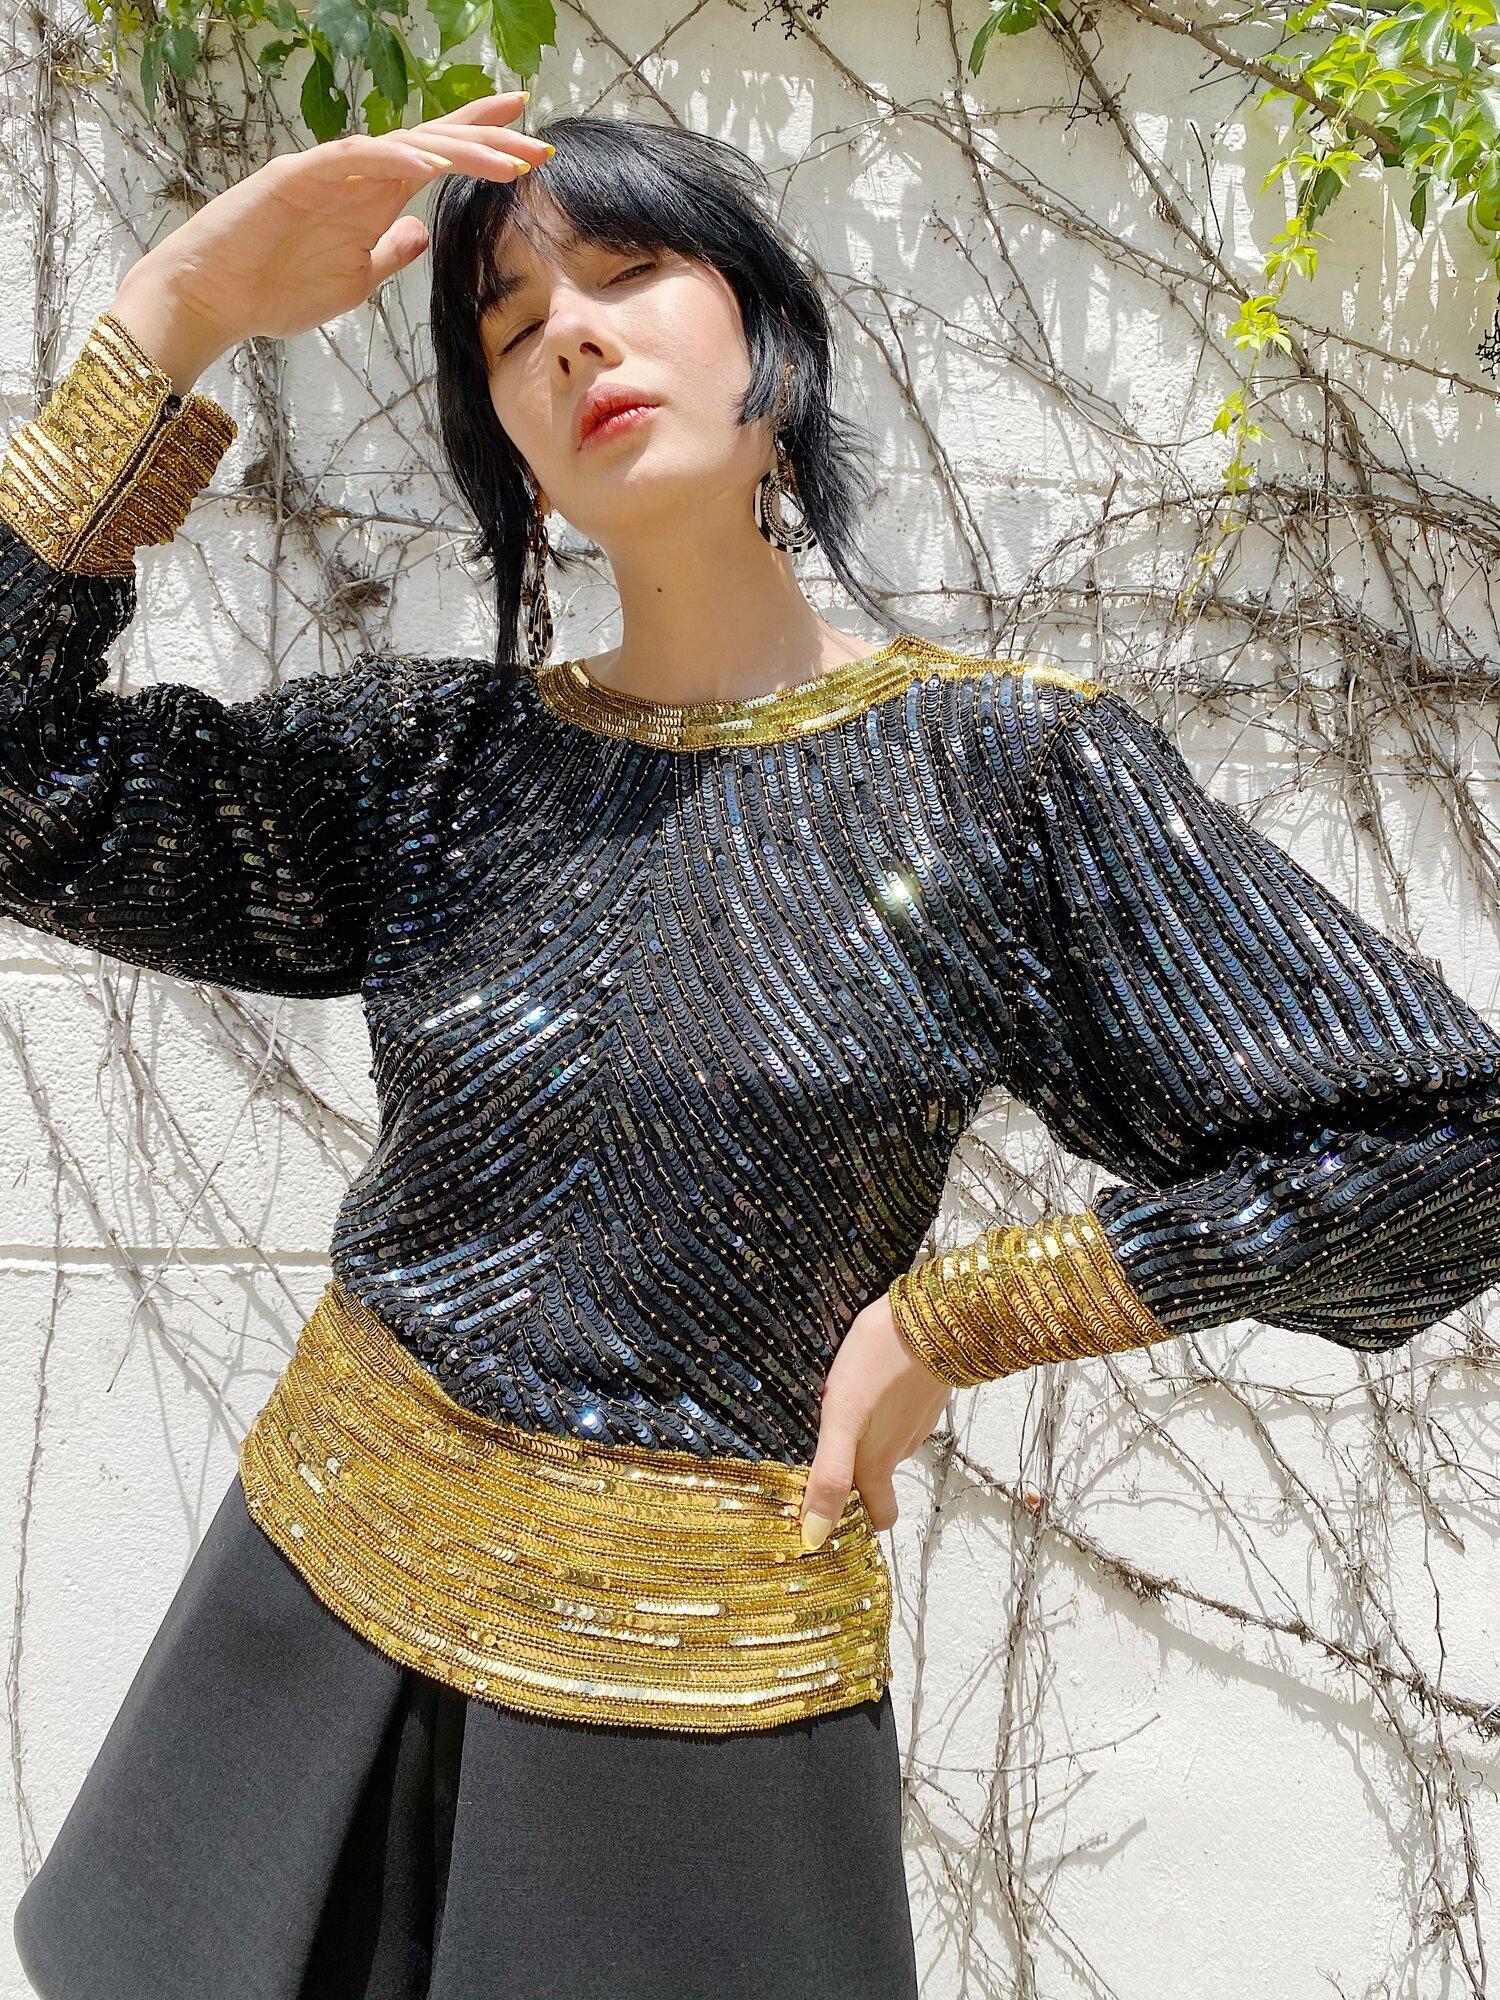 the Paris blouse vintage black and gold sequin top medium